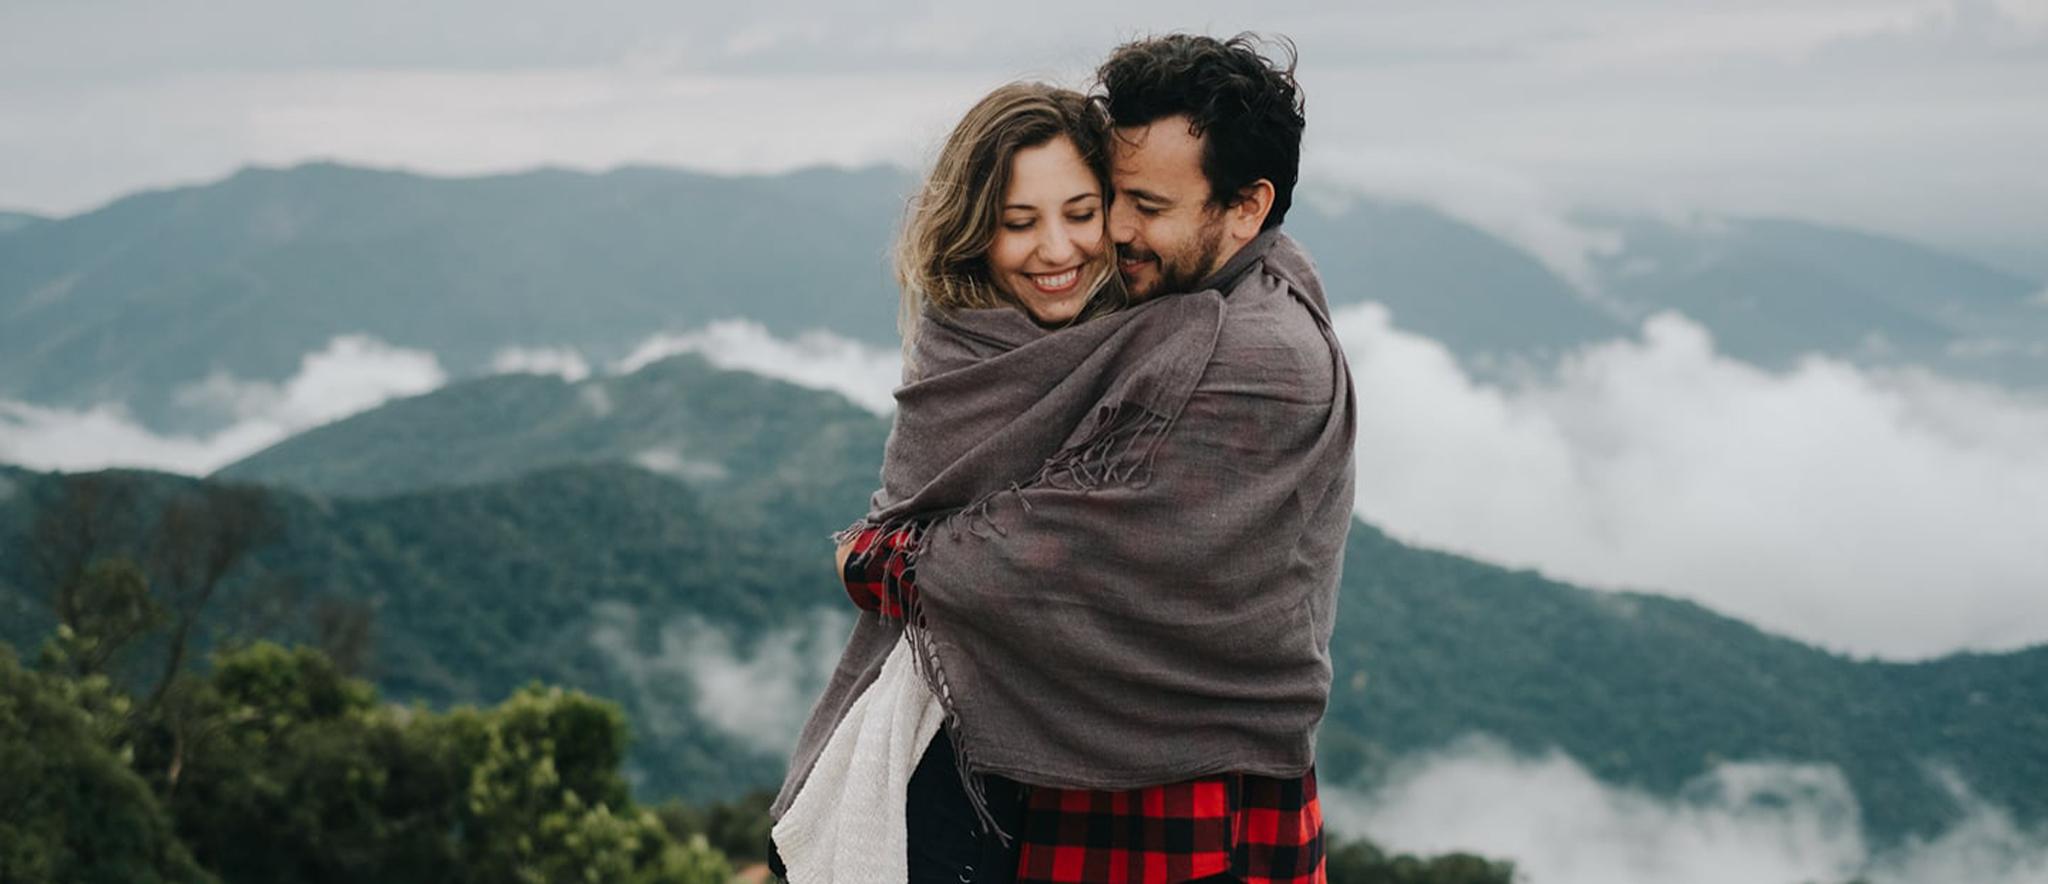 Sobre ClickDois - Fotógrafos de Casamento e Família